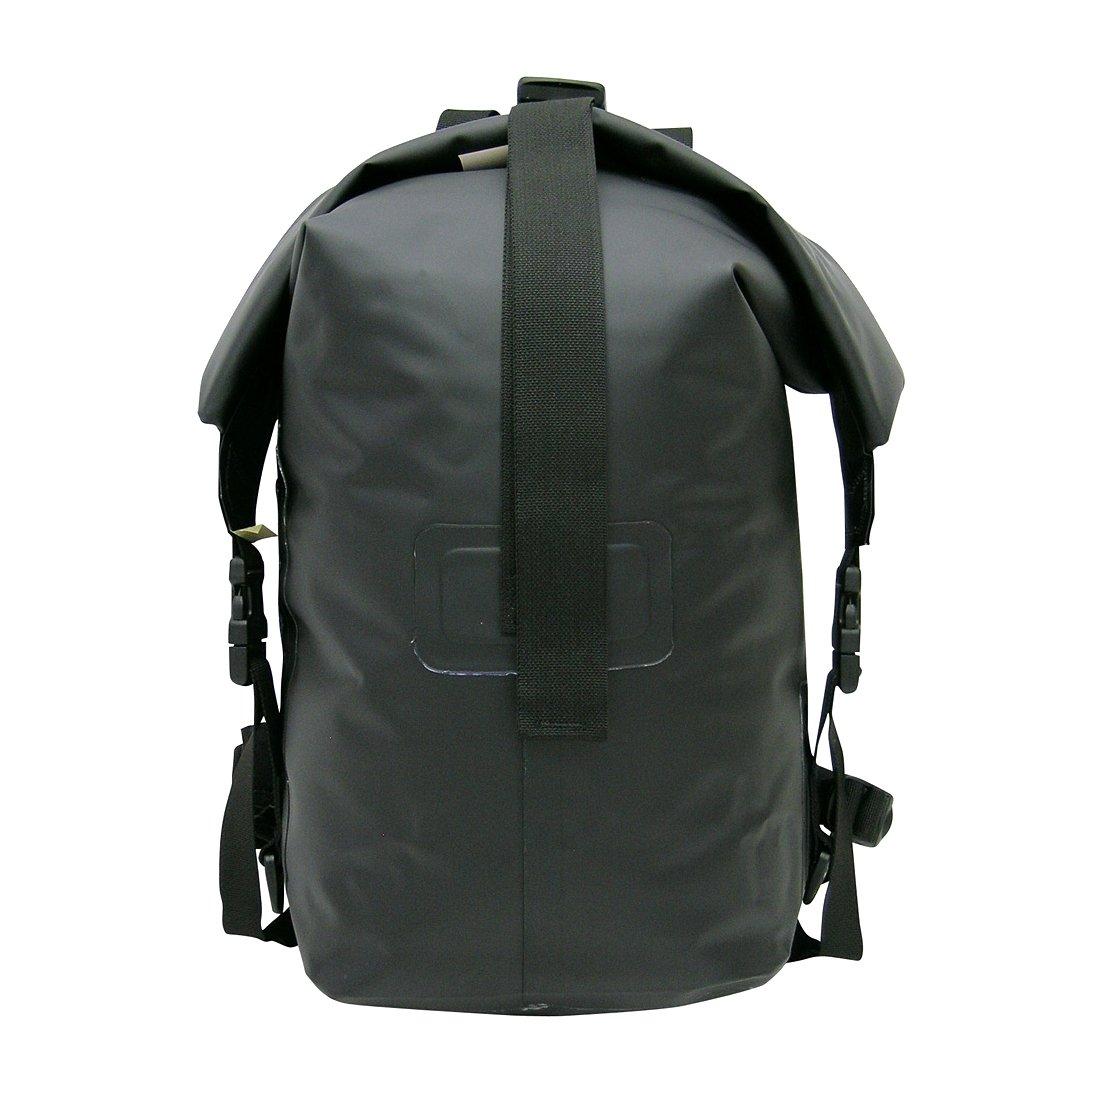 a7caefce3c48 Amazon.com  Watershed Big Creek Waterproof Backpack